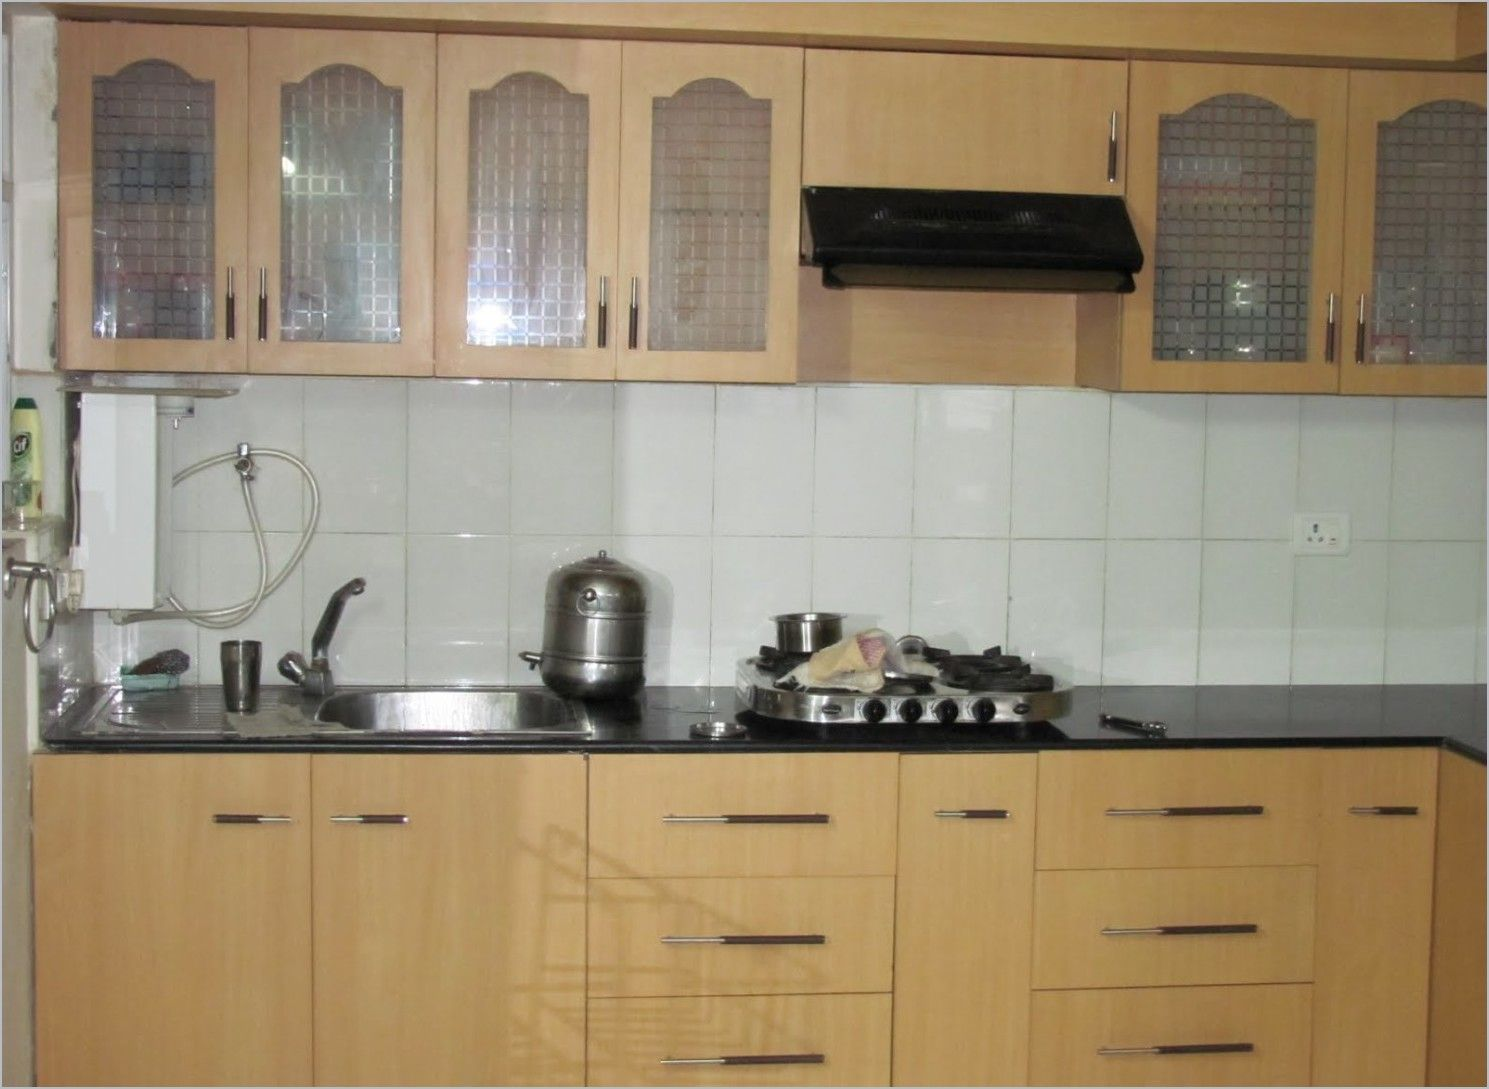 Modular Kitchen Interior Designs And Ideas Best Home Design Fair How To Design A Modular Kitchen Decorating Design